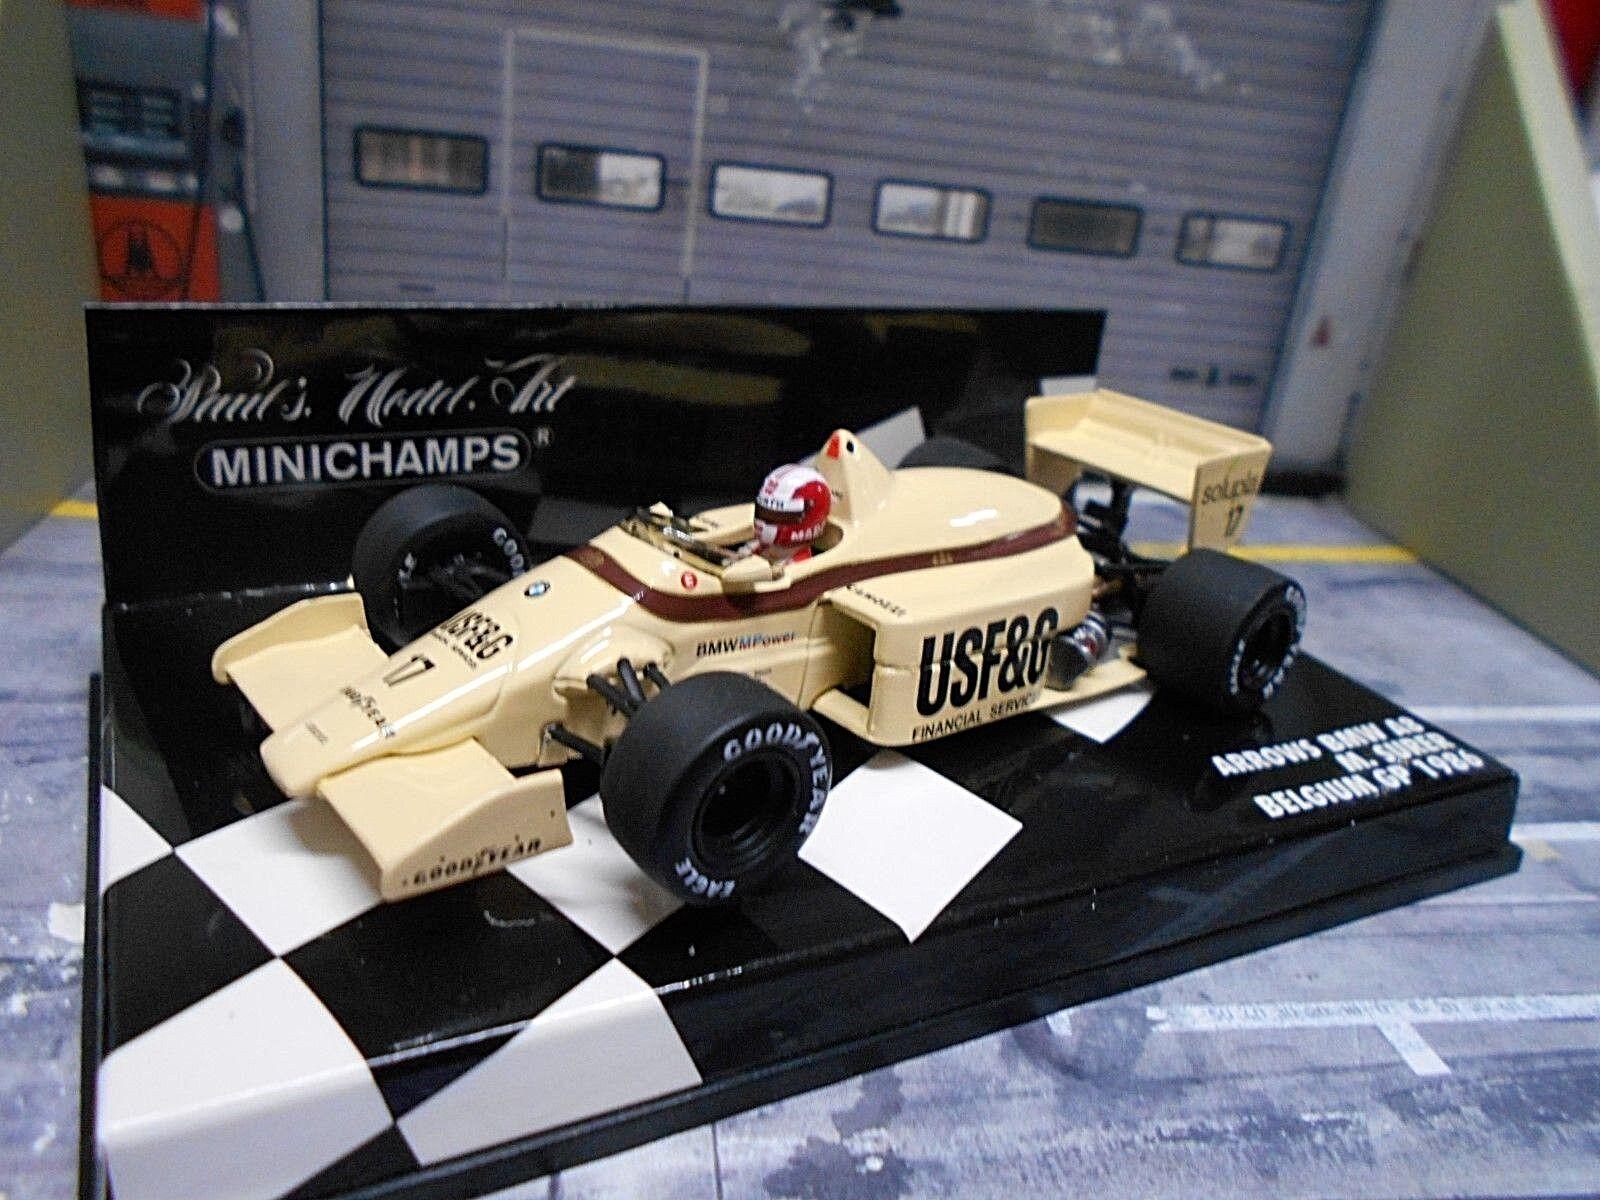 F1 Arrows BMW Turbo a8 GP Belgique 1986  17 Surer USAF & G MINICHAMPS RAR 1 43